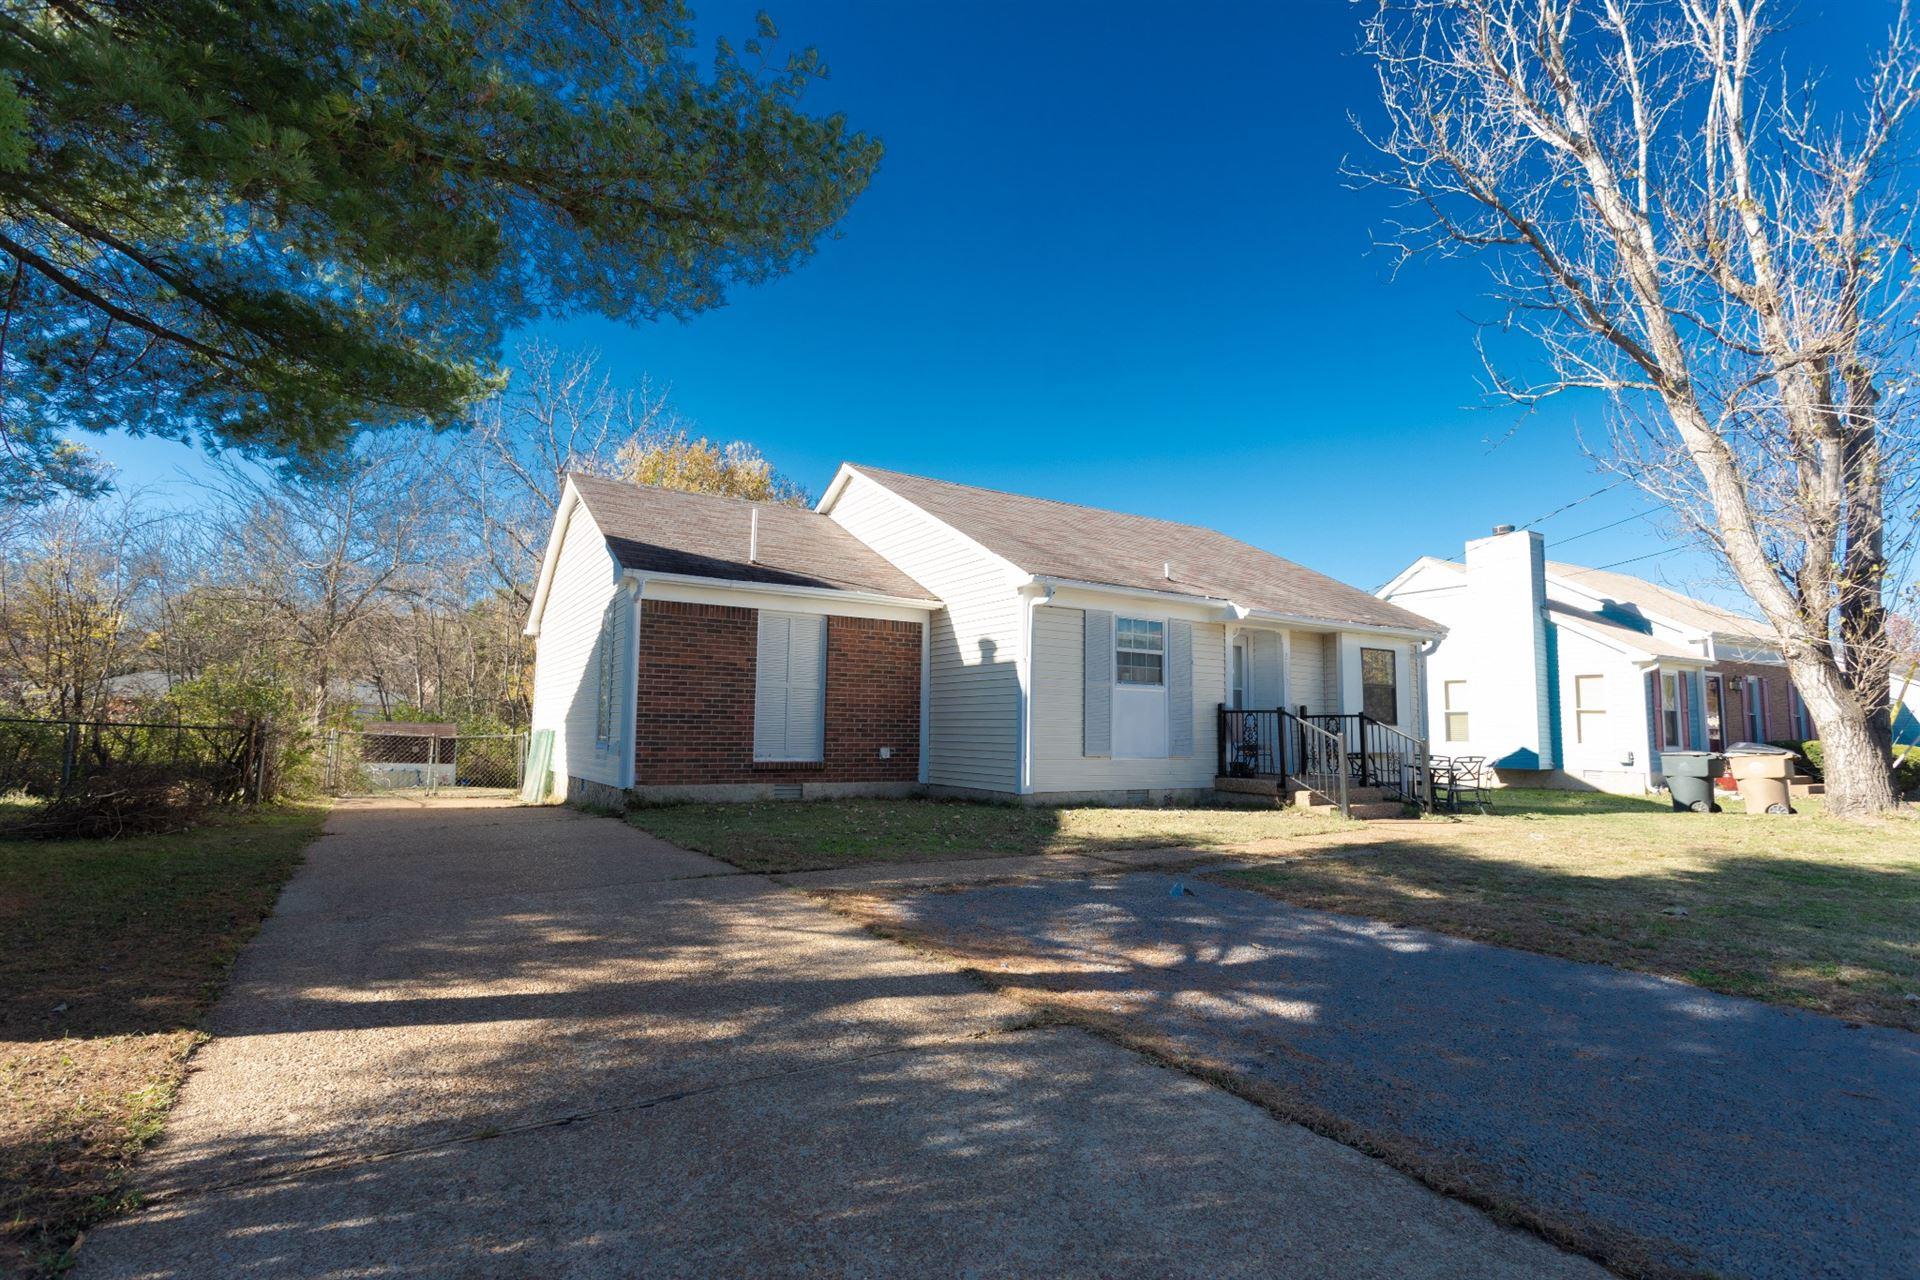 2969 Owendale Dr, Antioch, TN 37013 - MLS#: 2207368